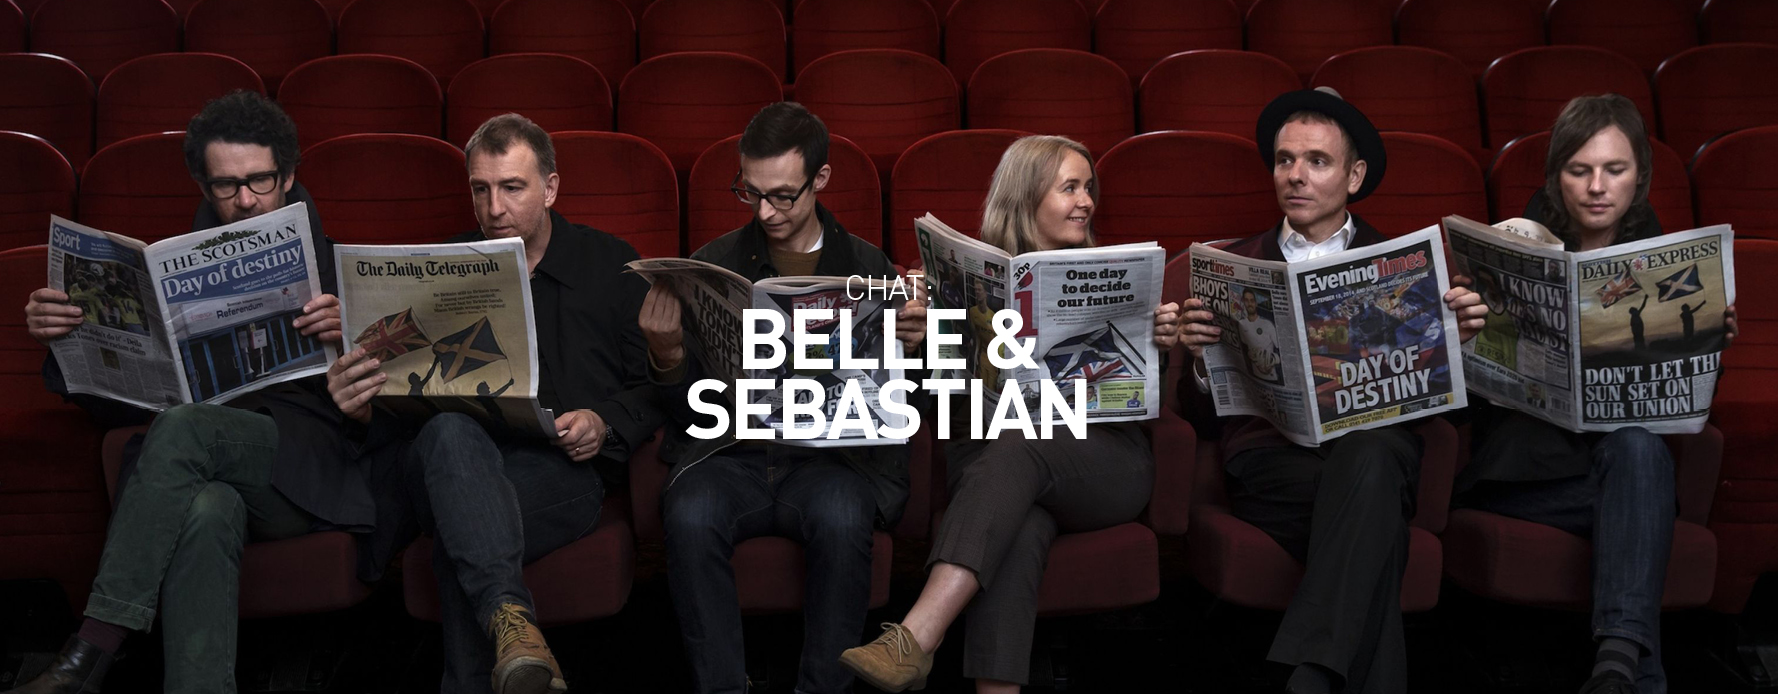 source: Belle And Sebastian